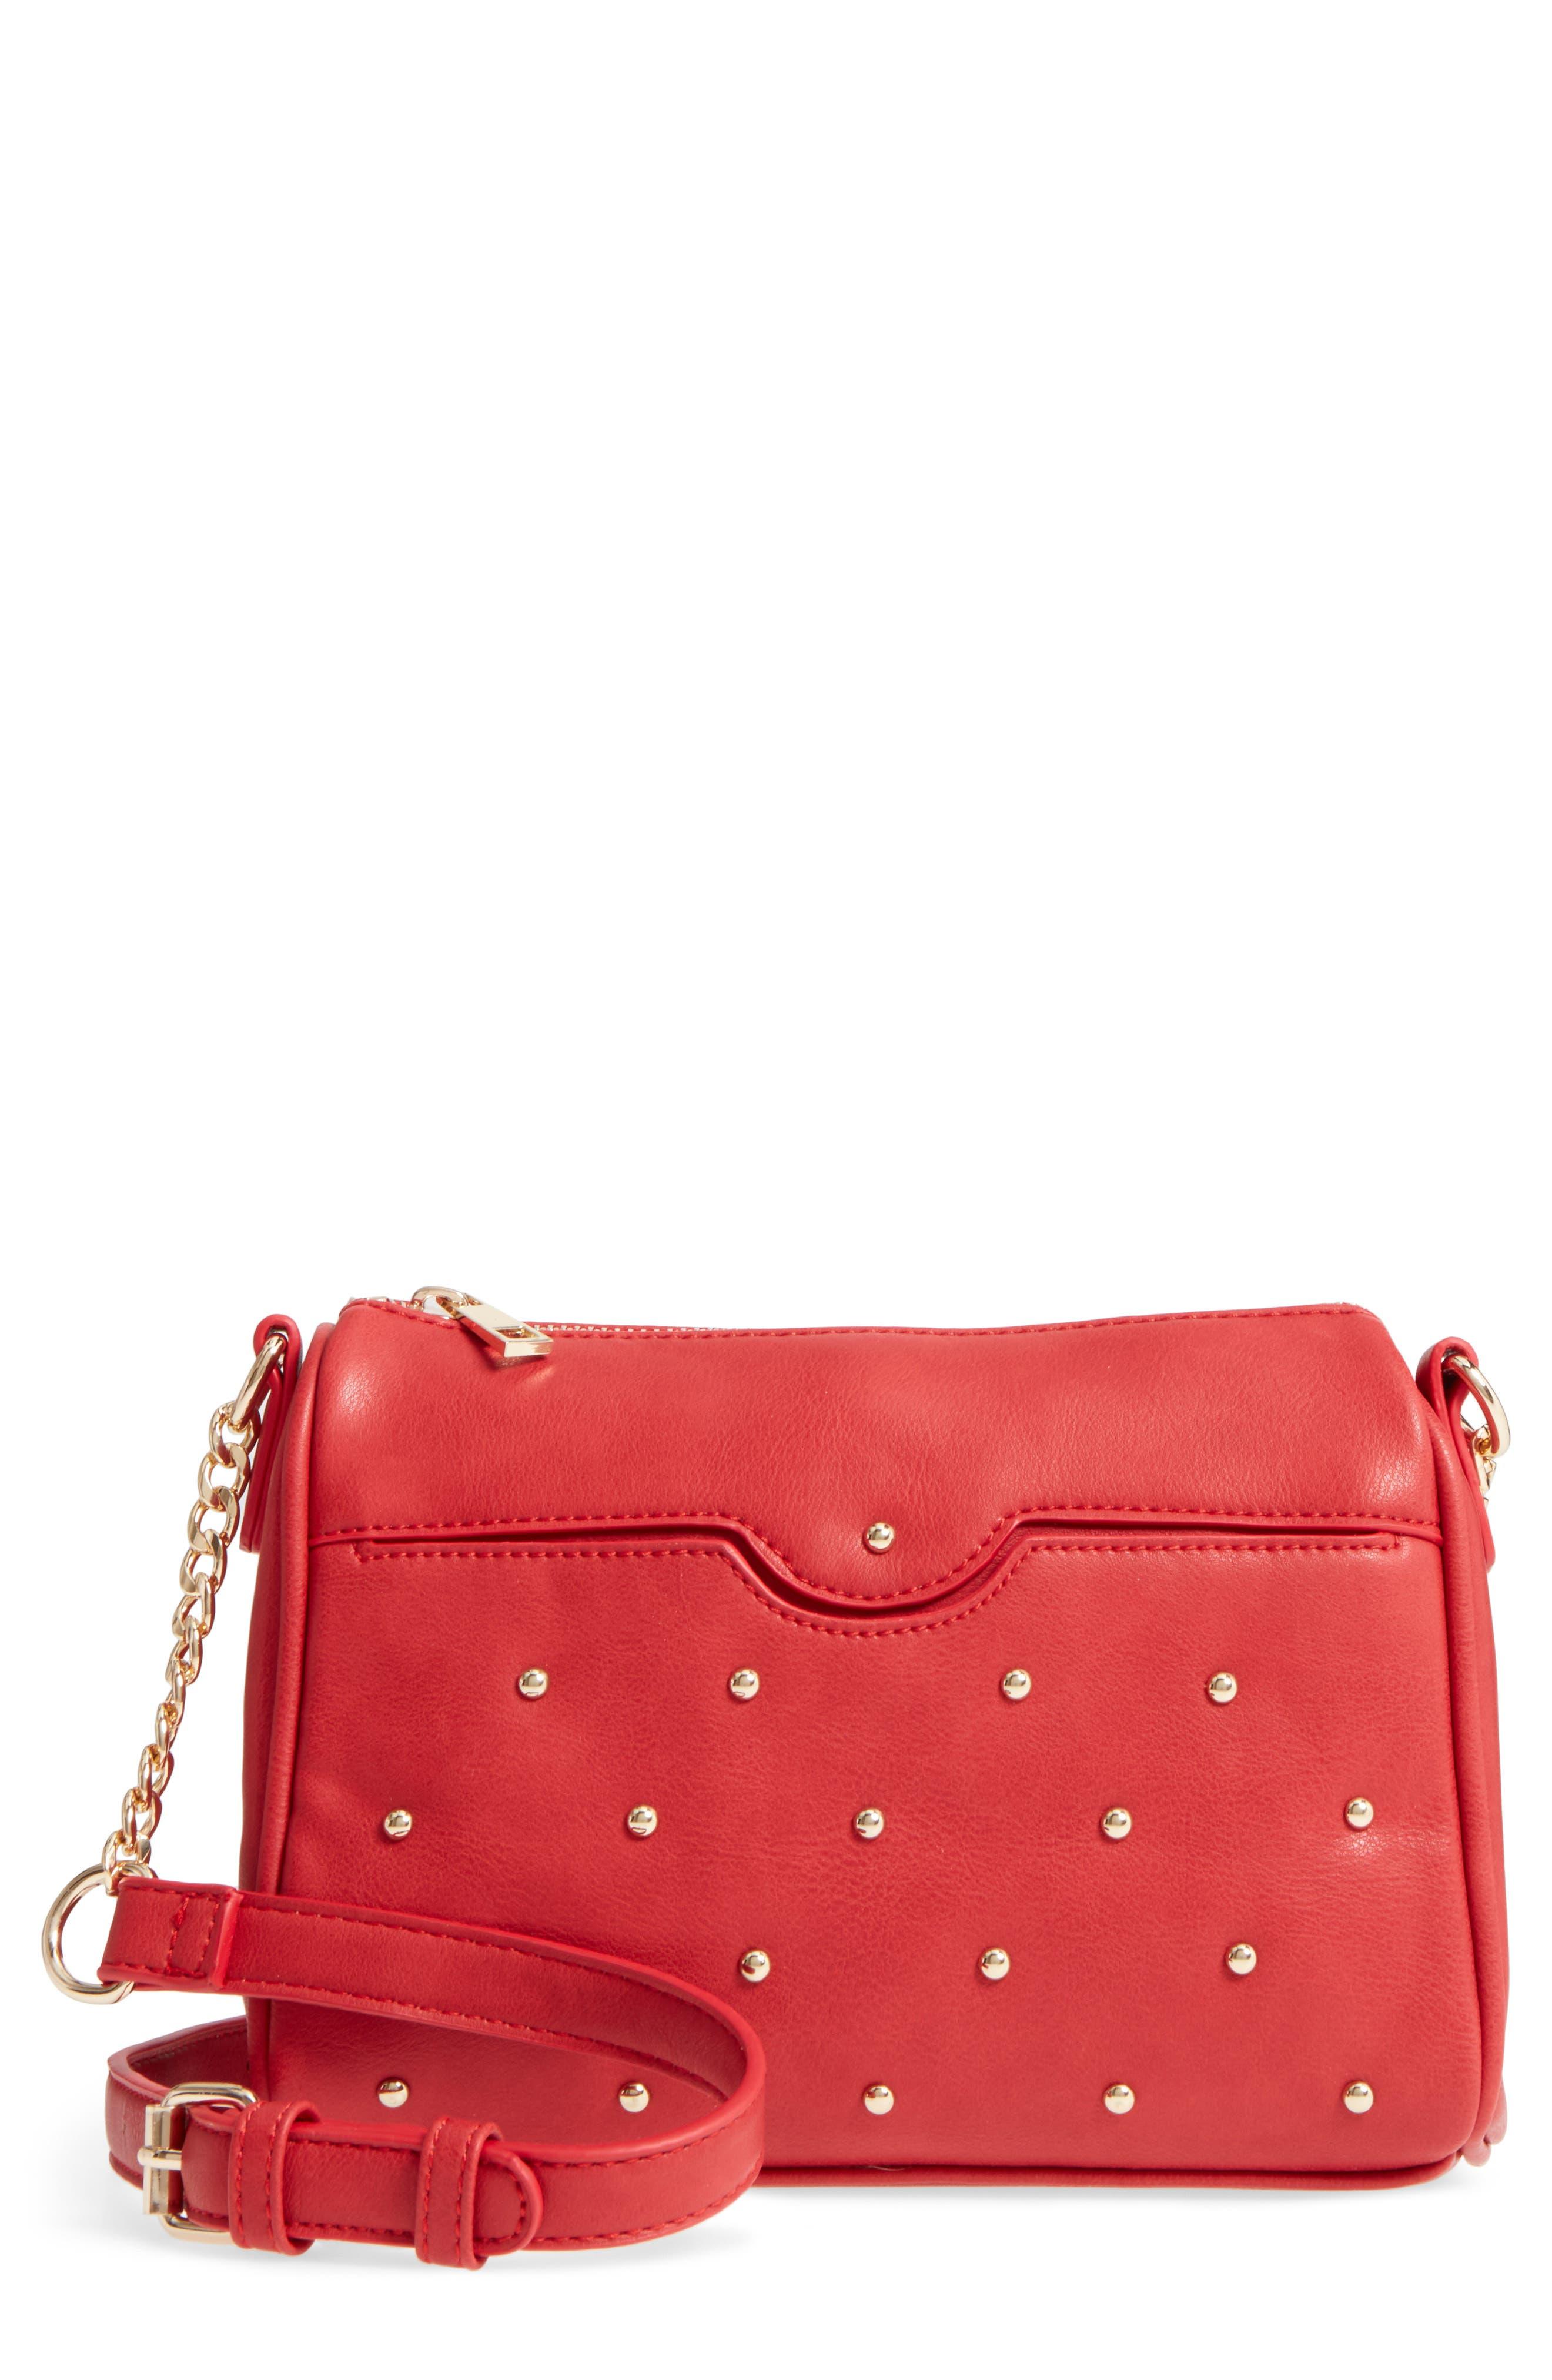 BP. Studded Faux Leather Crossbody Bag